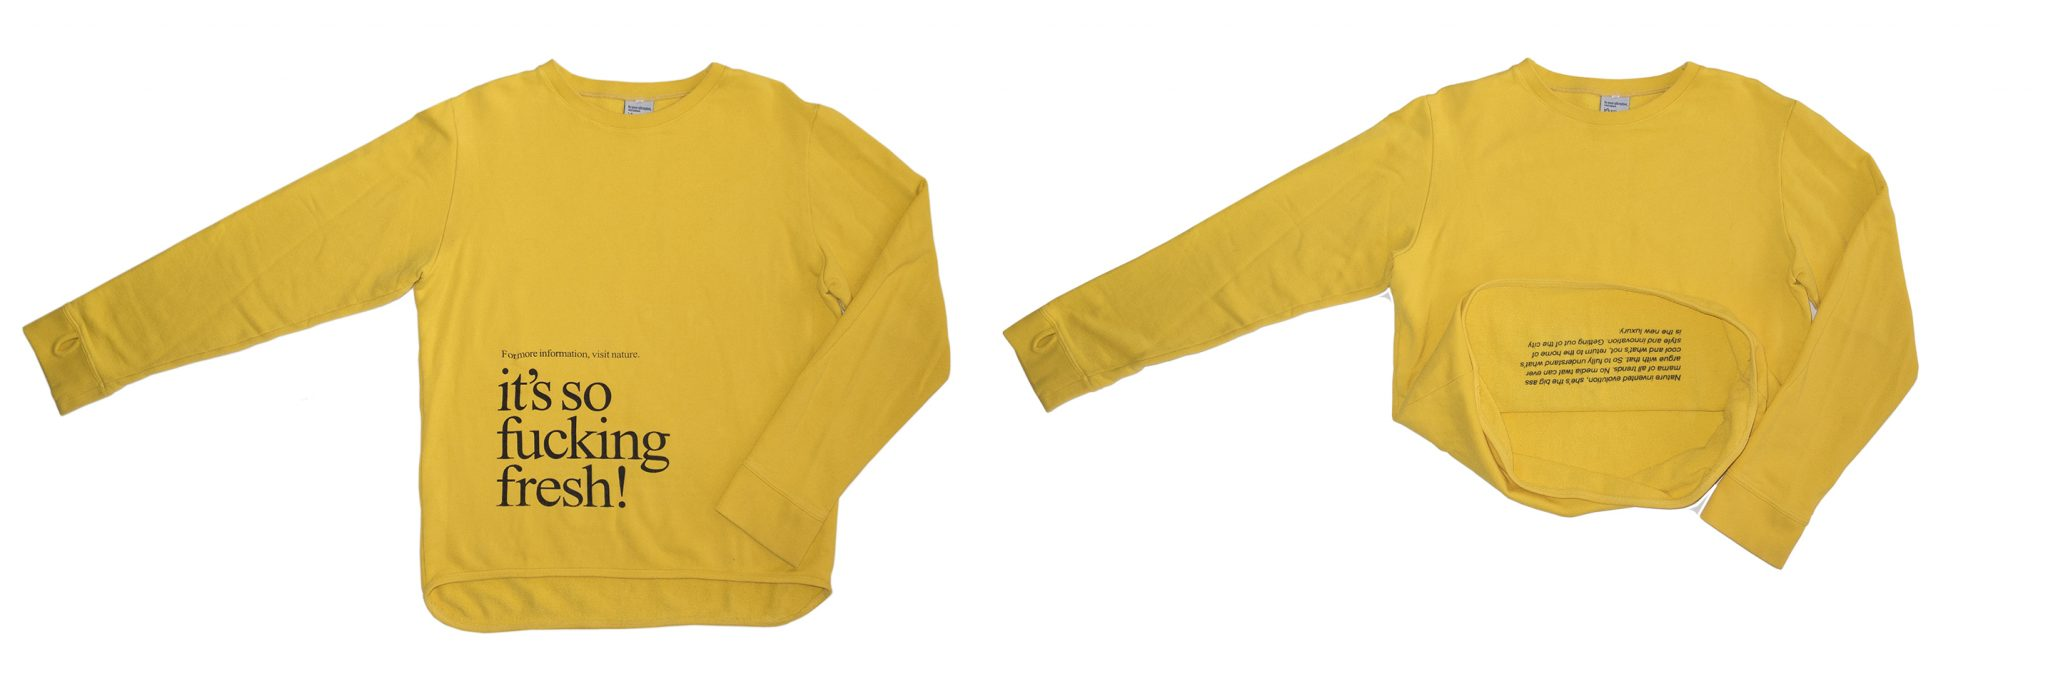 ISFF_yellow